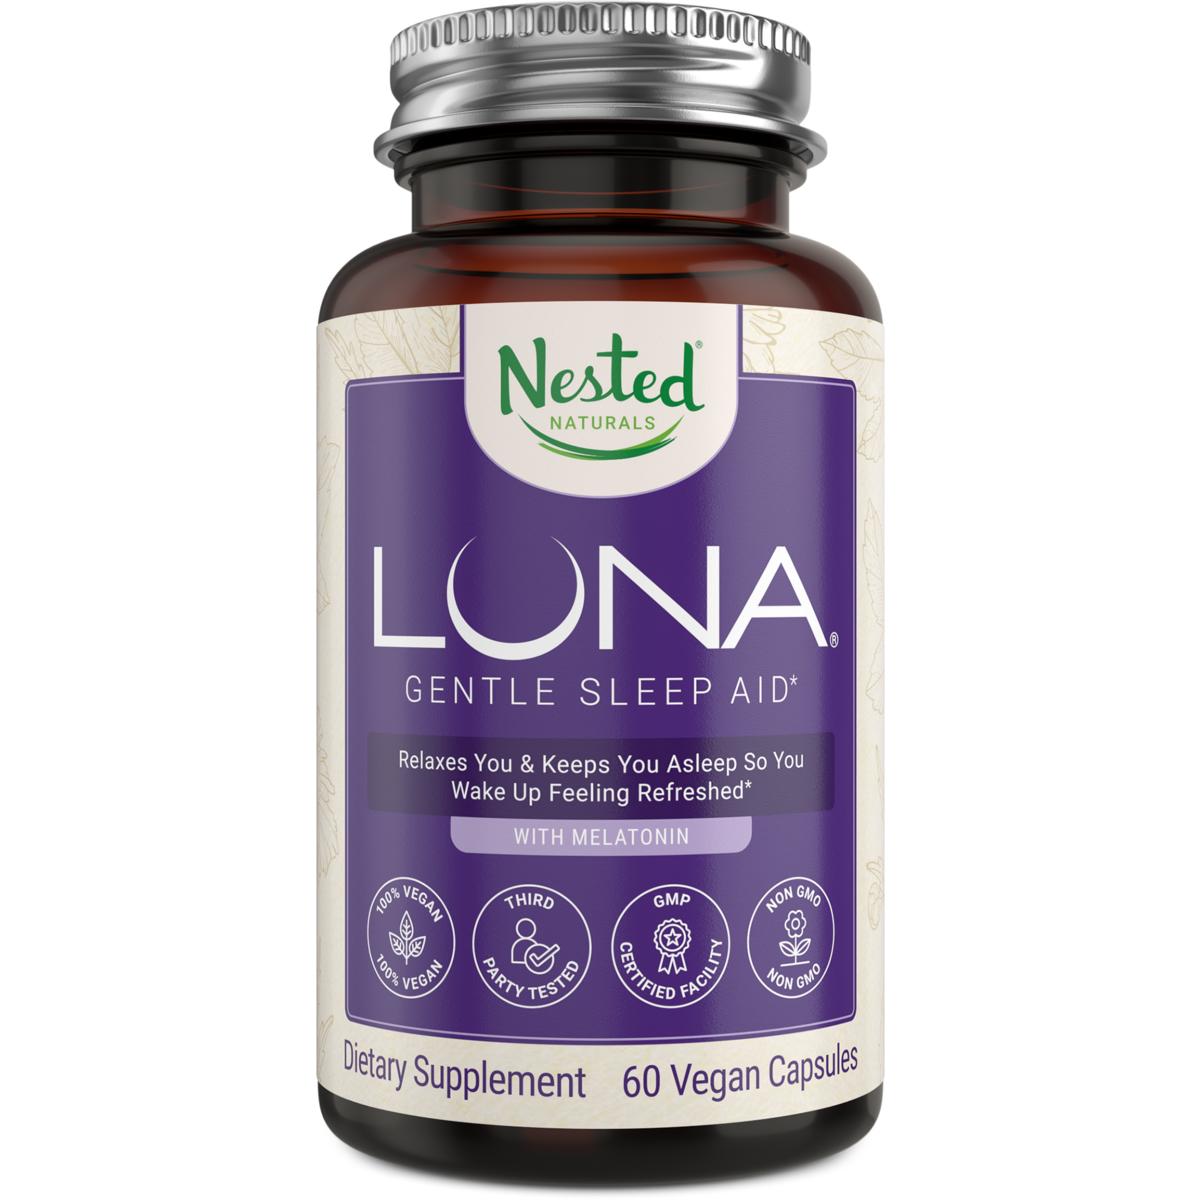 Nested Naturals LUNA Gentle Sleep Aid | #1 Sleep Aid on Amazon